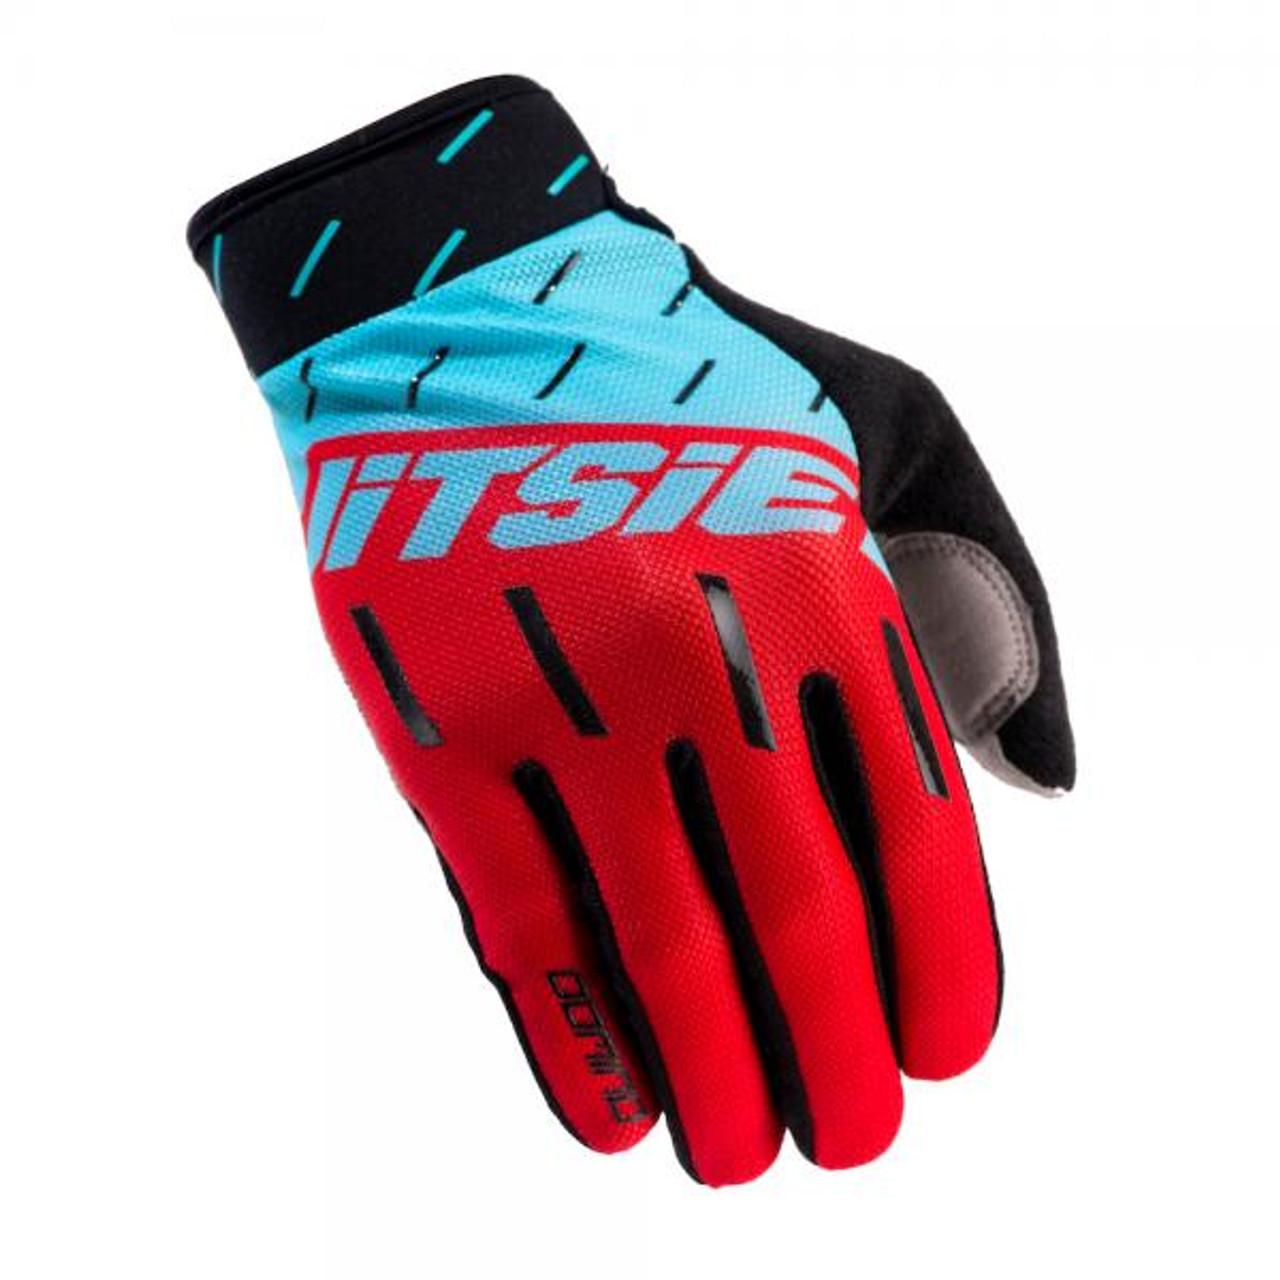 Gloves Domino, black/ red/teal